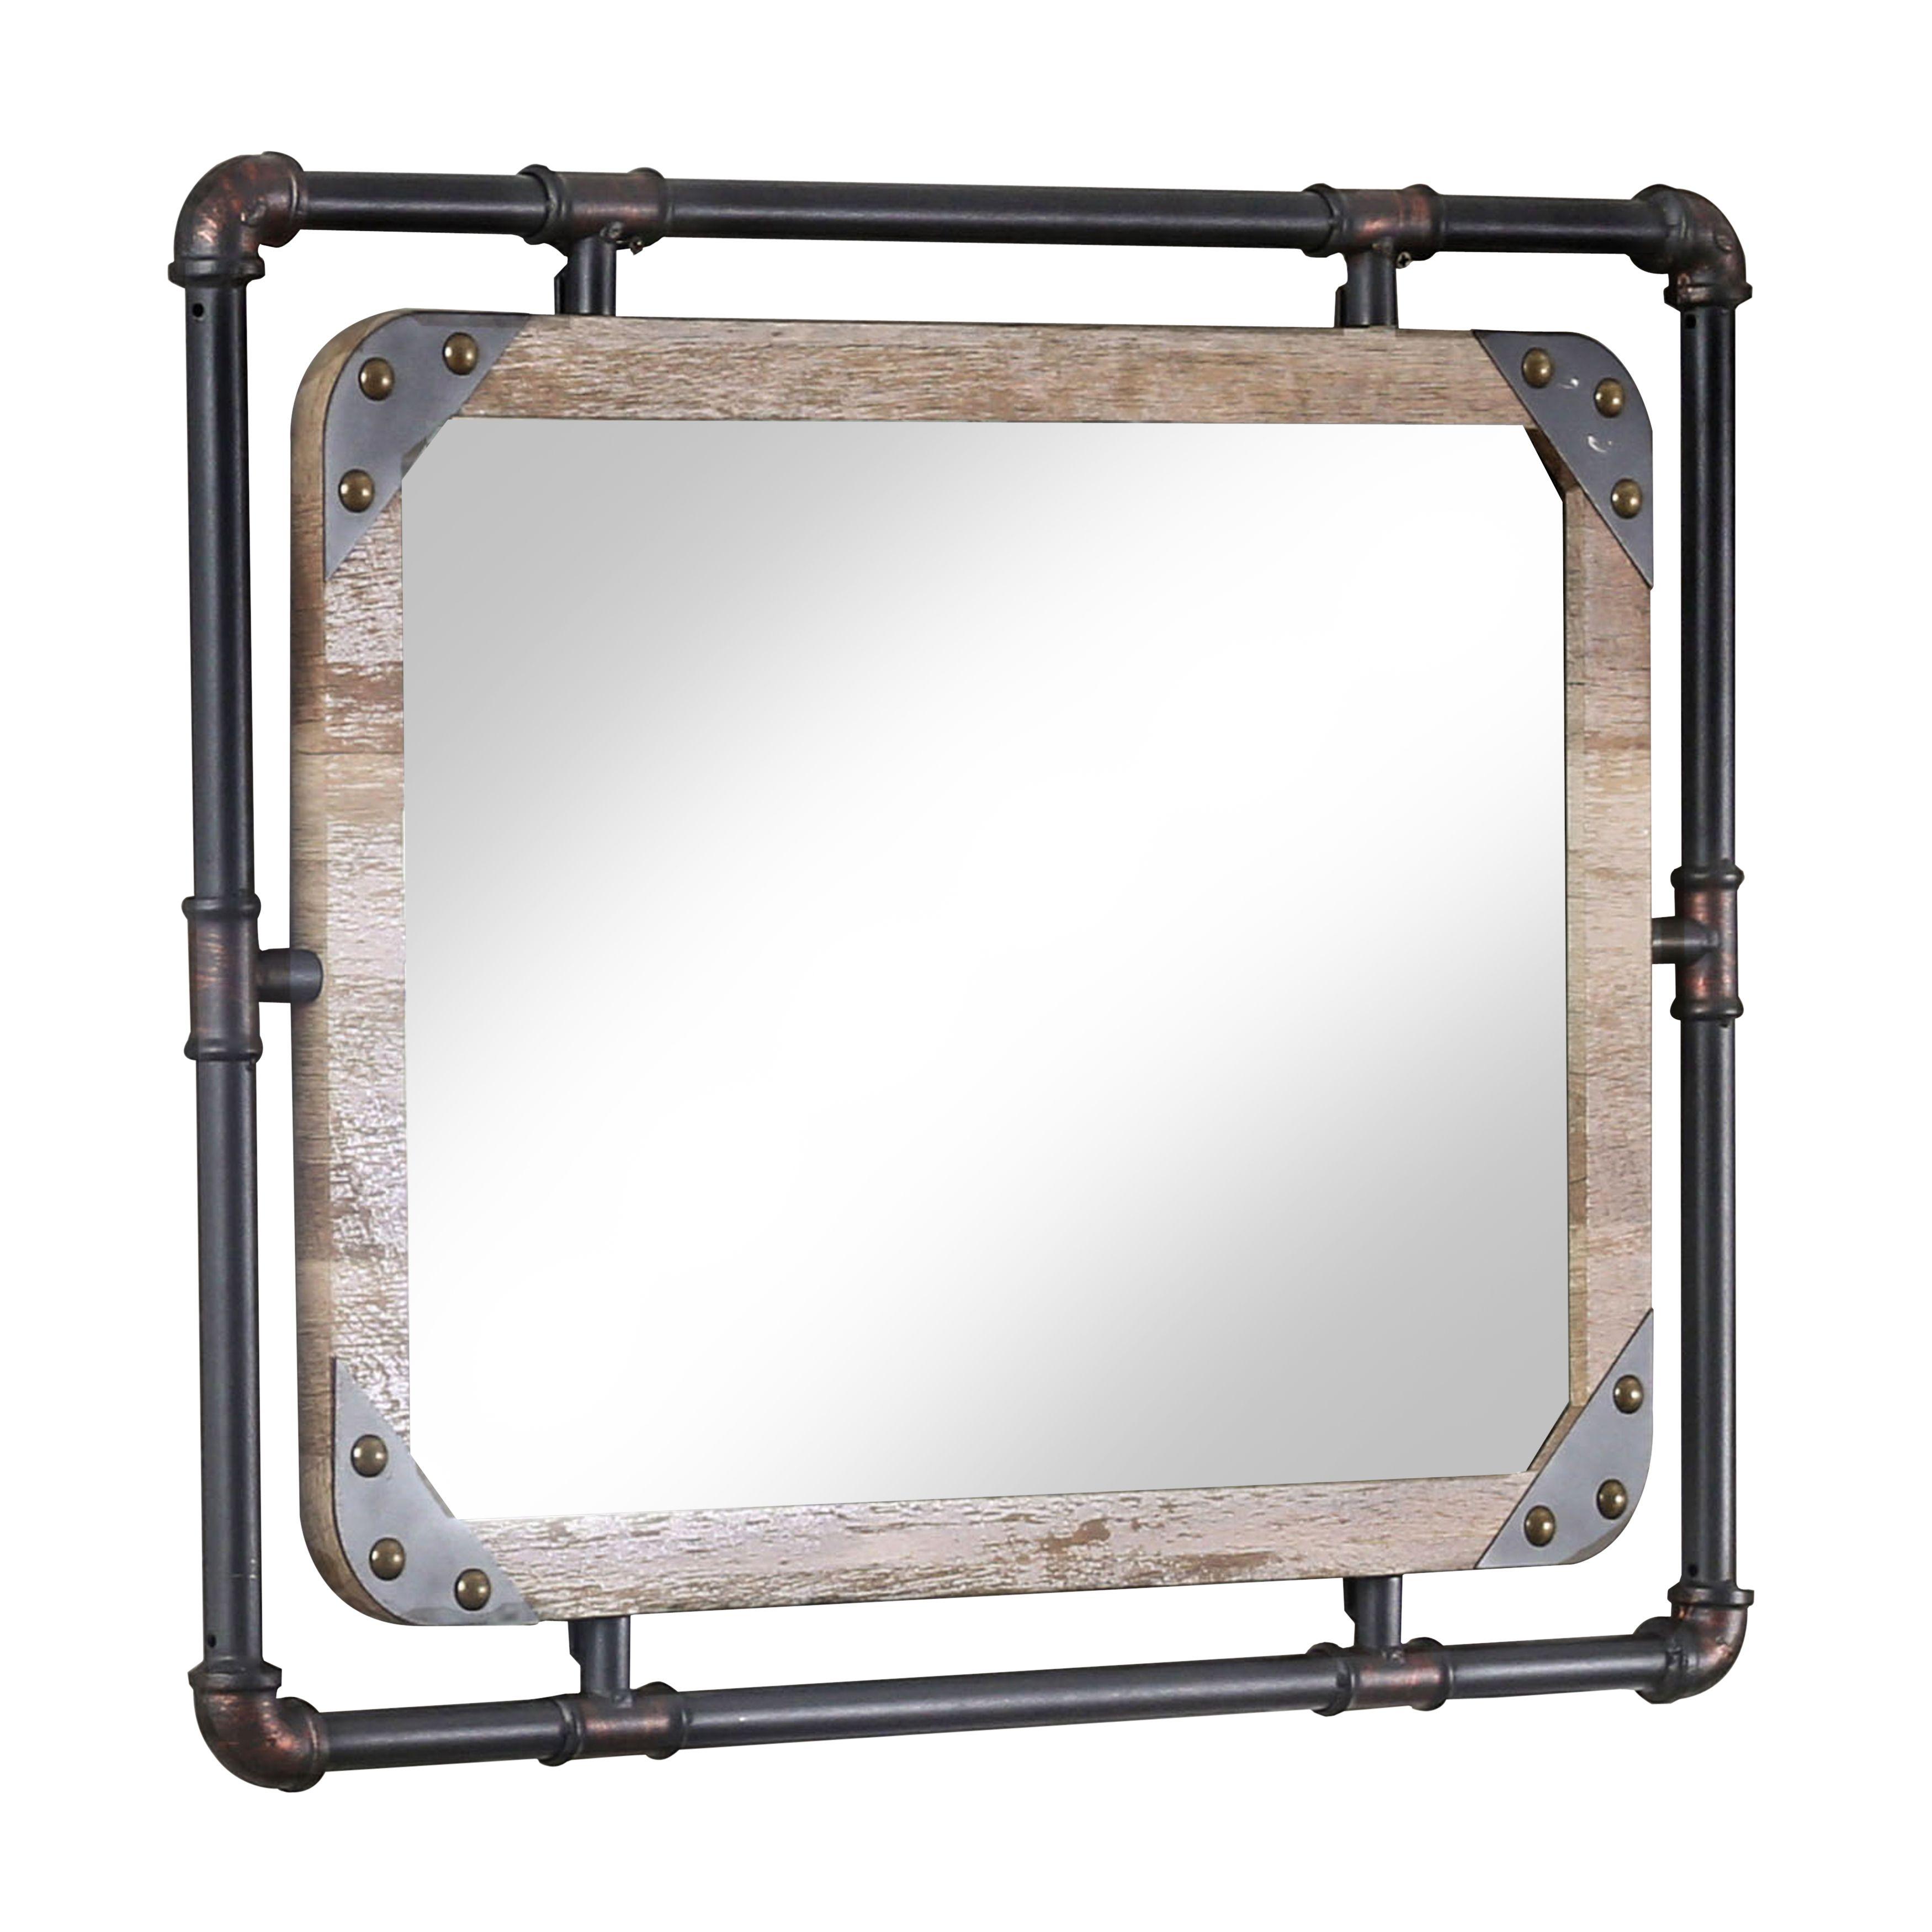 Furniture Of America Stockholm Industrial Decorative Wall Mirror 32 X24 Walmart Com In 2020 Industrial Wall Mirrors Mirror Wall Mirror Wall Bedroom